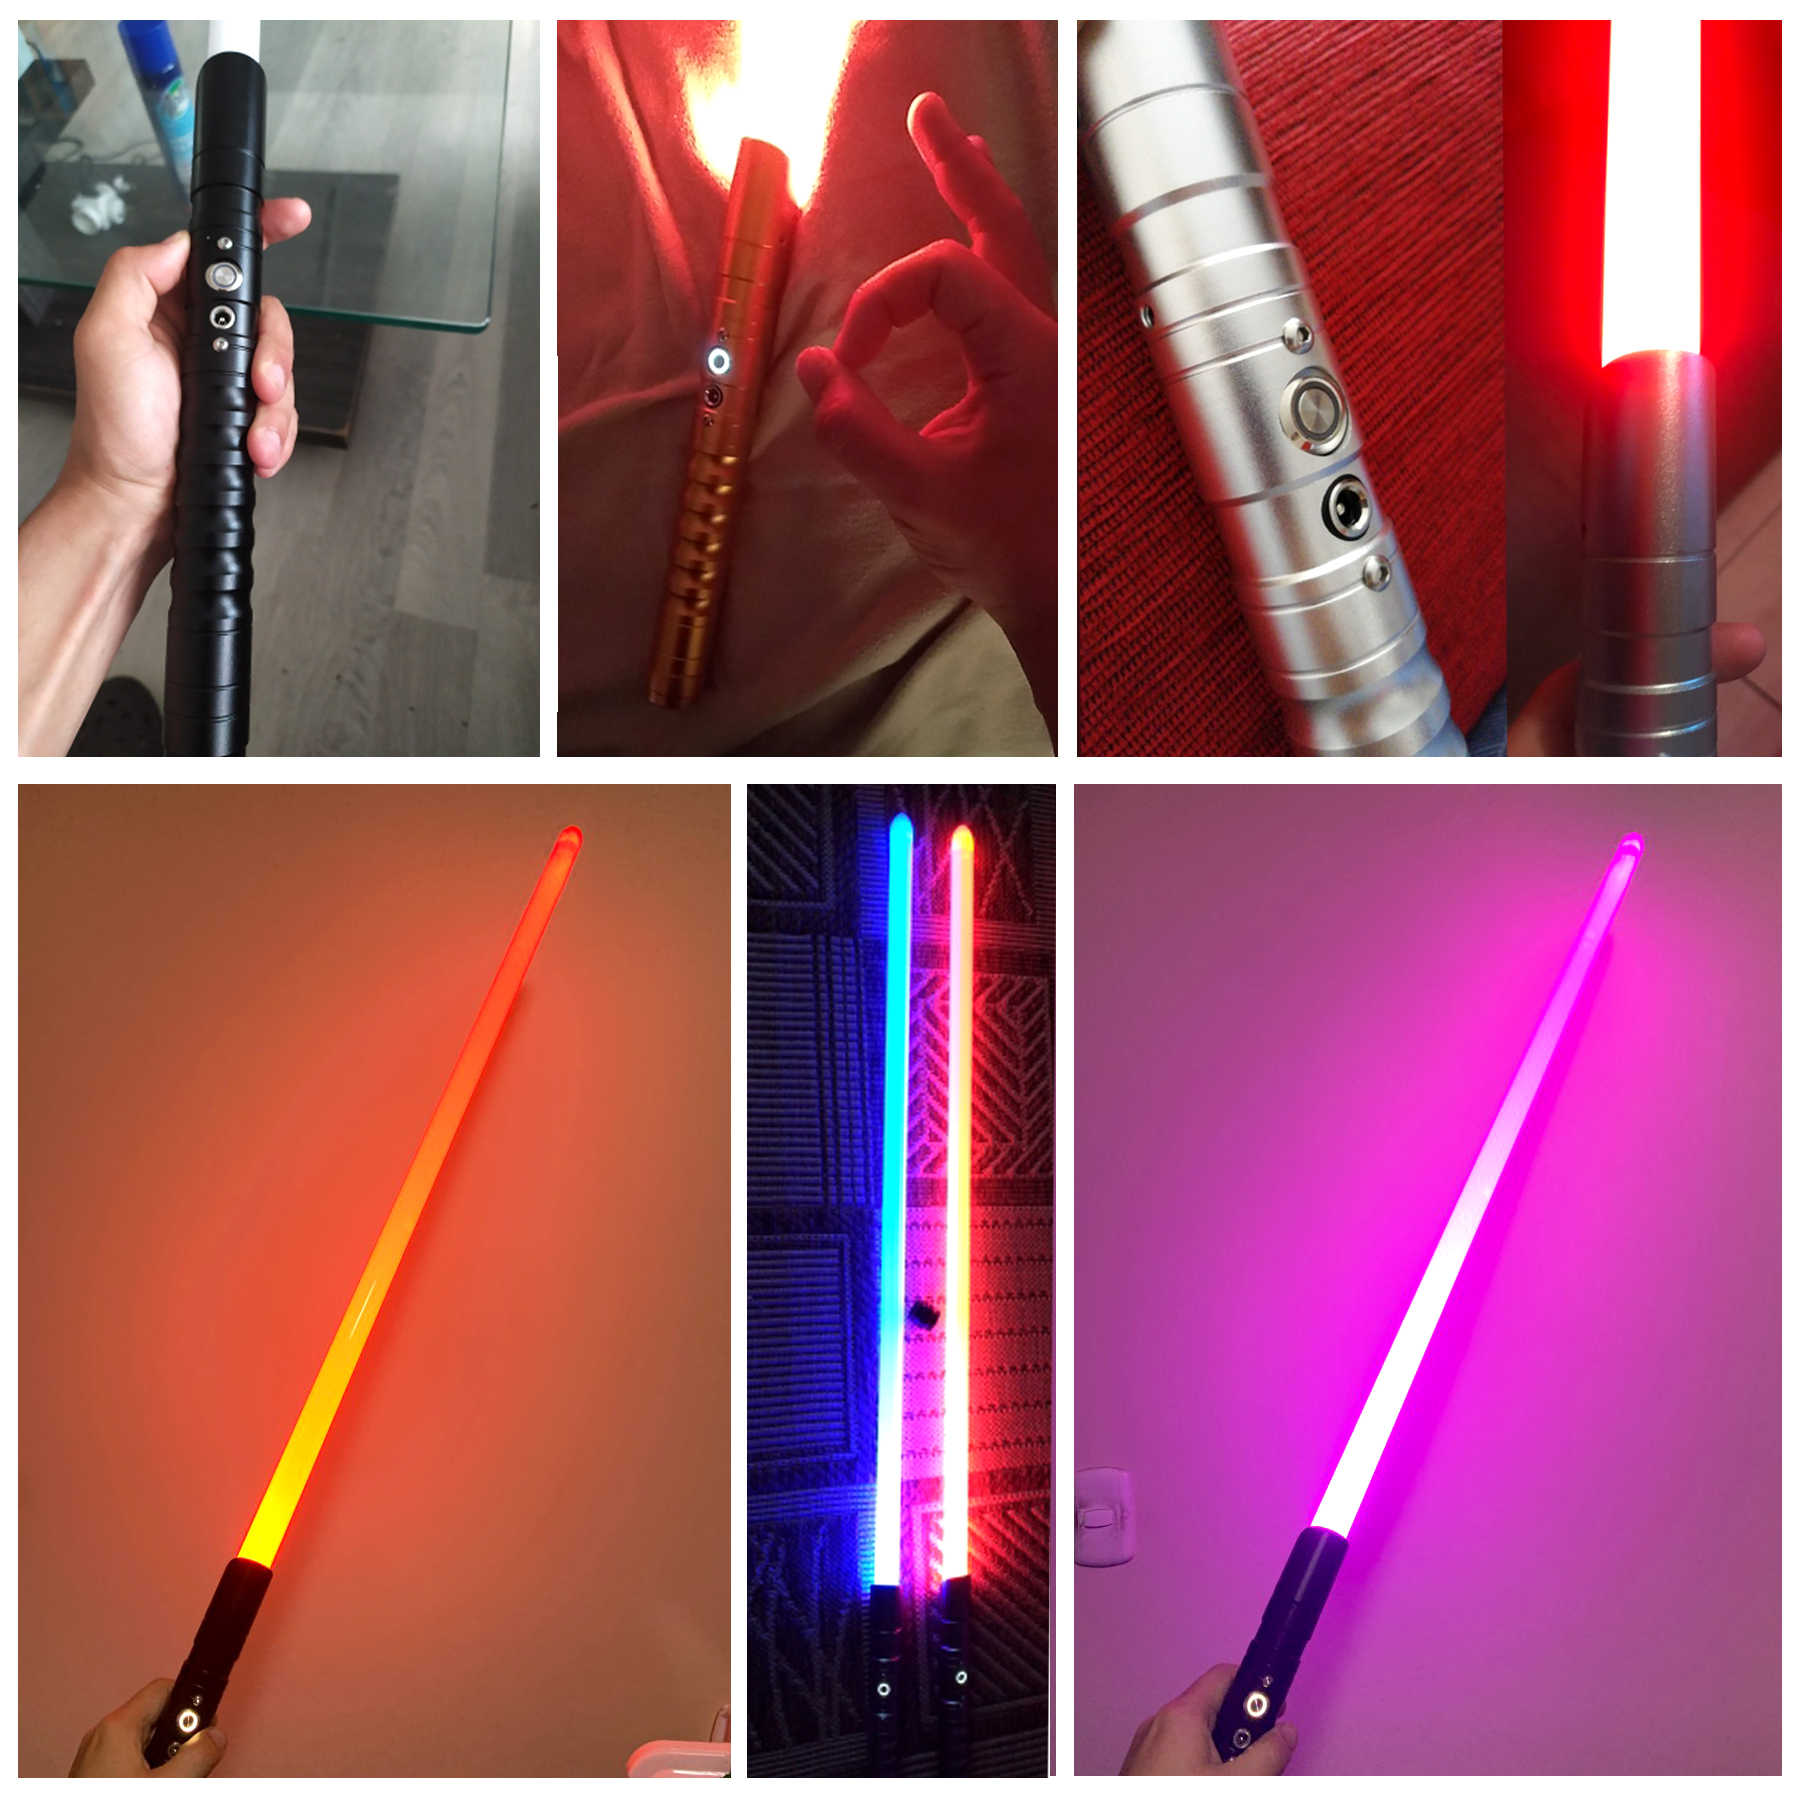 Baru 11 Warna Lightsaber Pedang Logam RGB Laser 2019 Cosplay Anak Seperti Mainan Berkedip Anak-anak Hadiah Lampu Outdoor Kreatif Perang mainan